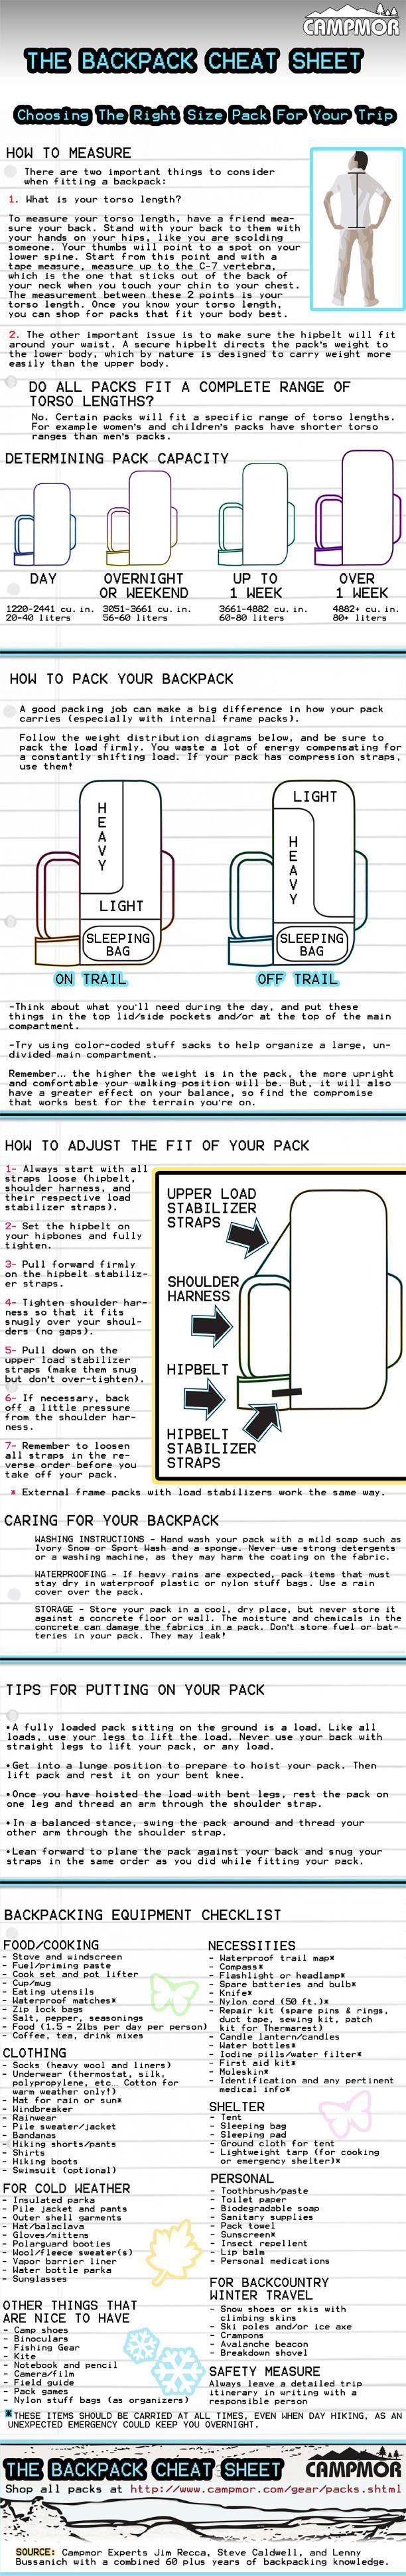 backpack-cheat-sheet-campmor.jpg (612×3885)